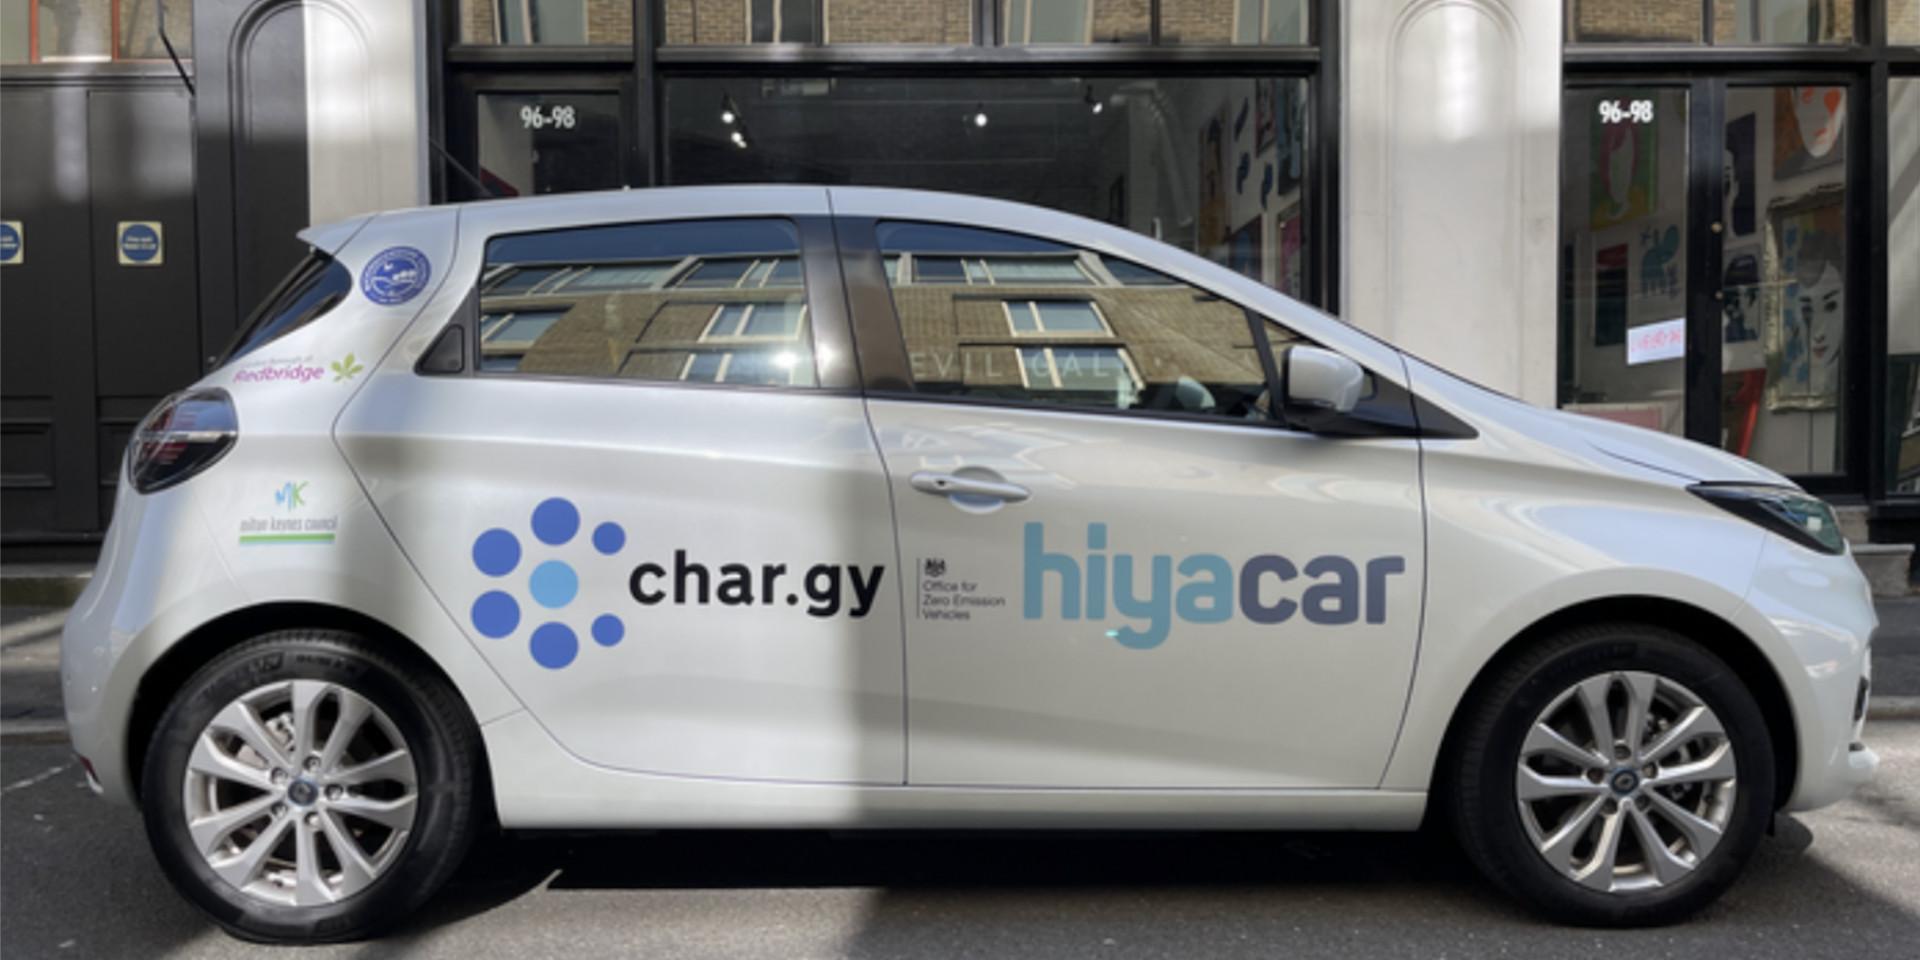 Char.gy - Hiyacar Wireless charging car